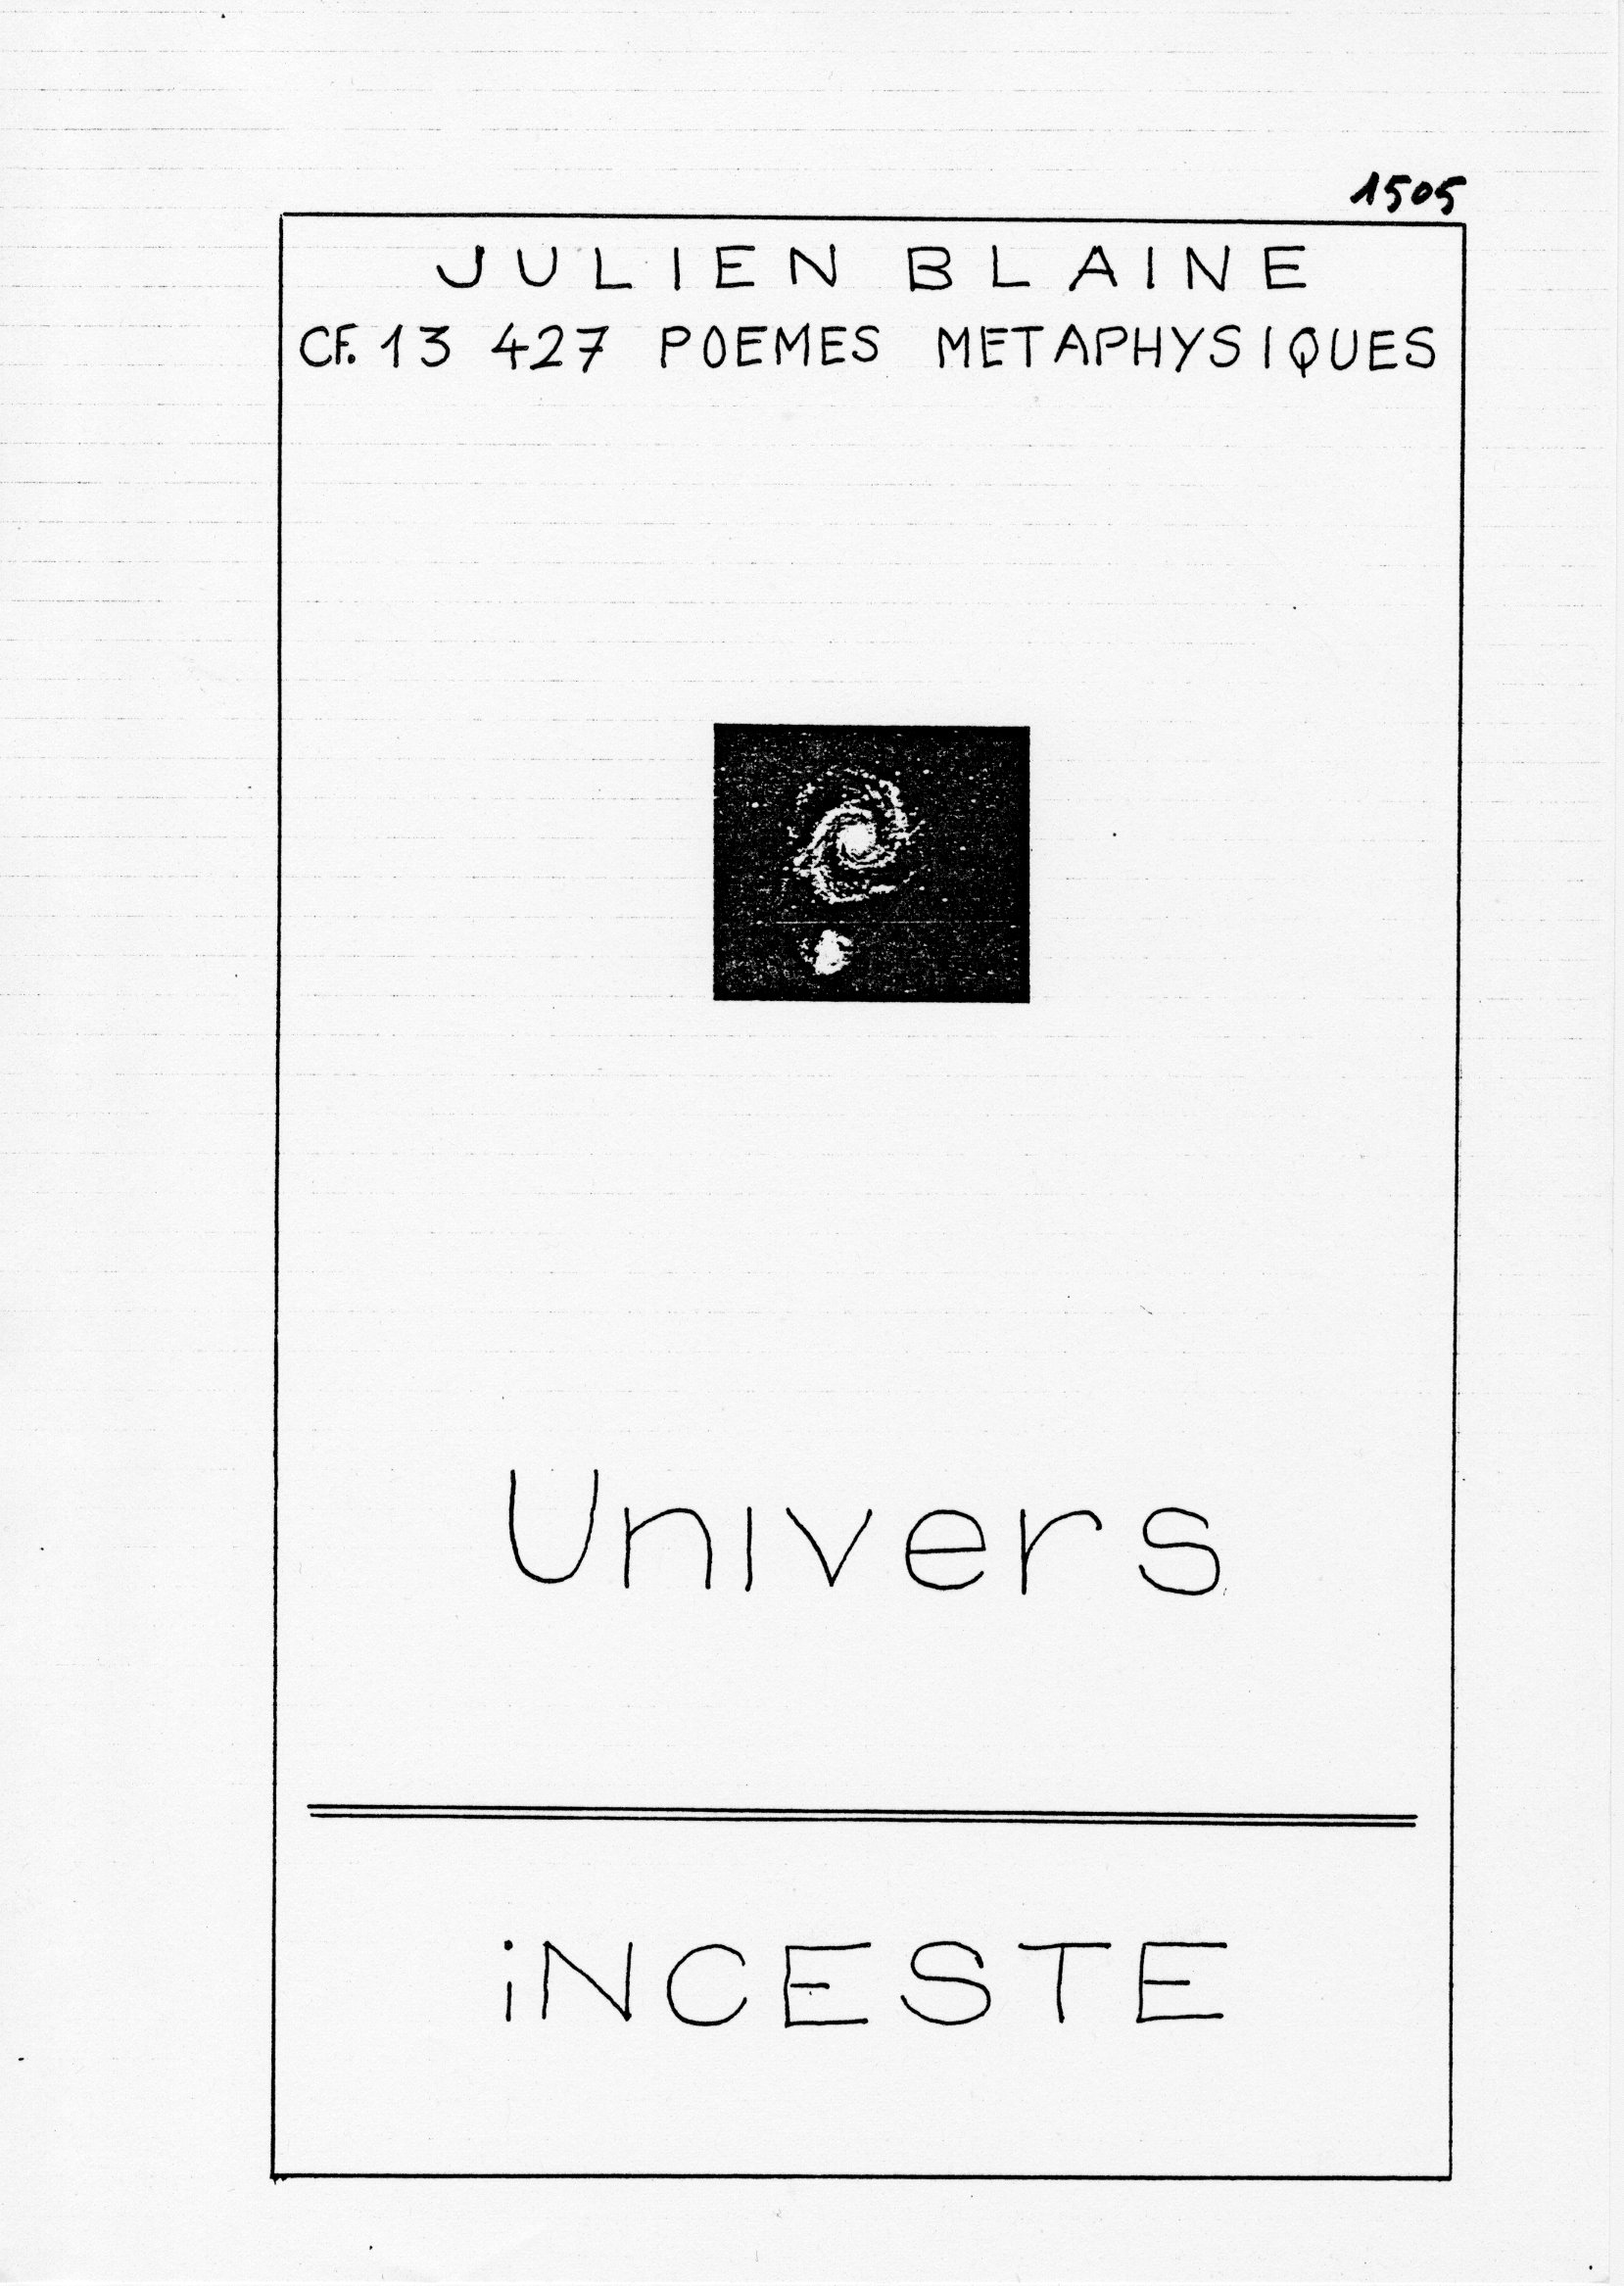 page 1505 J. Blaine UNIVERS INCESTE